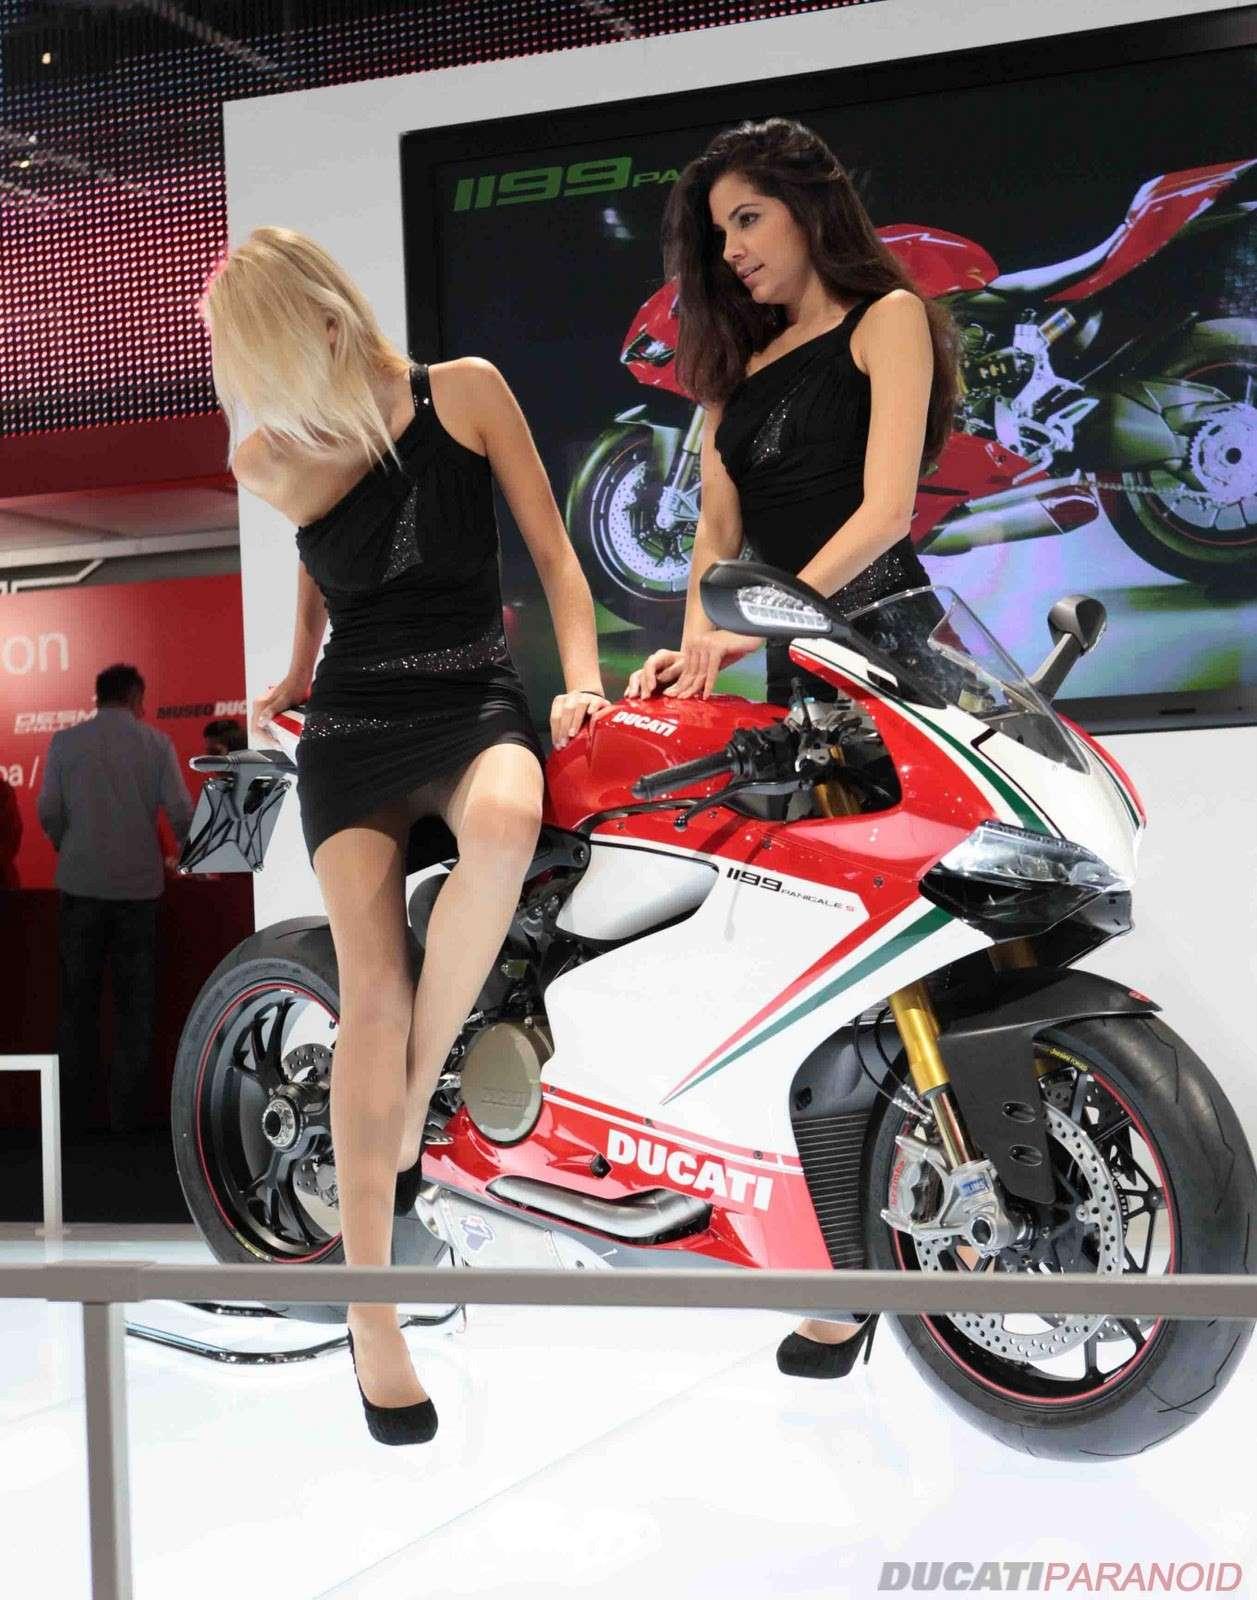 ducati 1199 Panigale ( Topic N°2 ) - Page 39 Ducati17